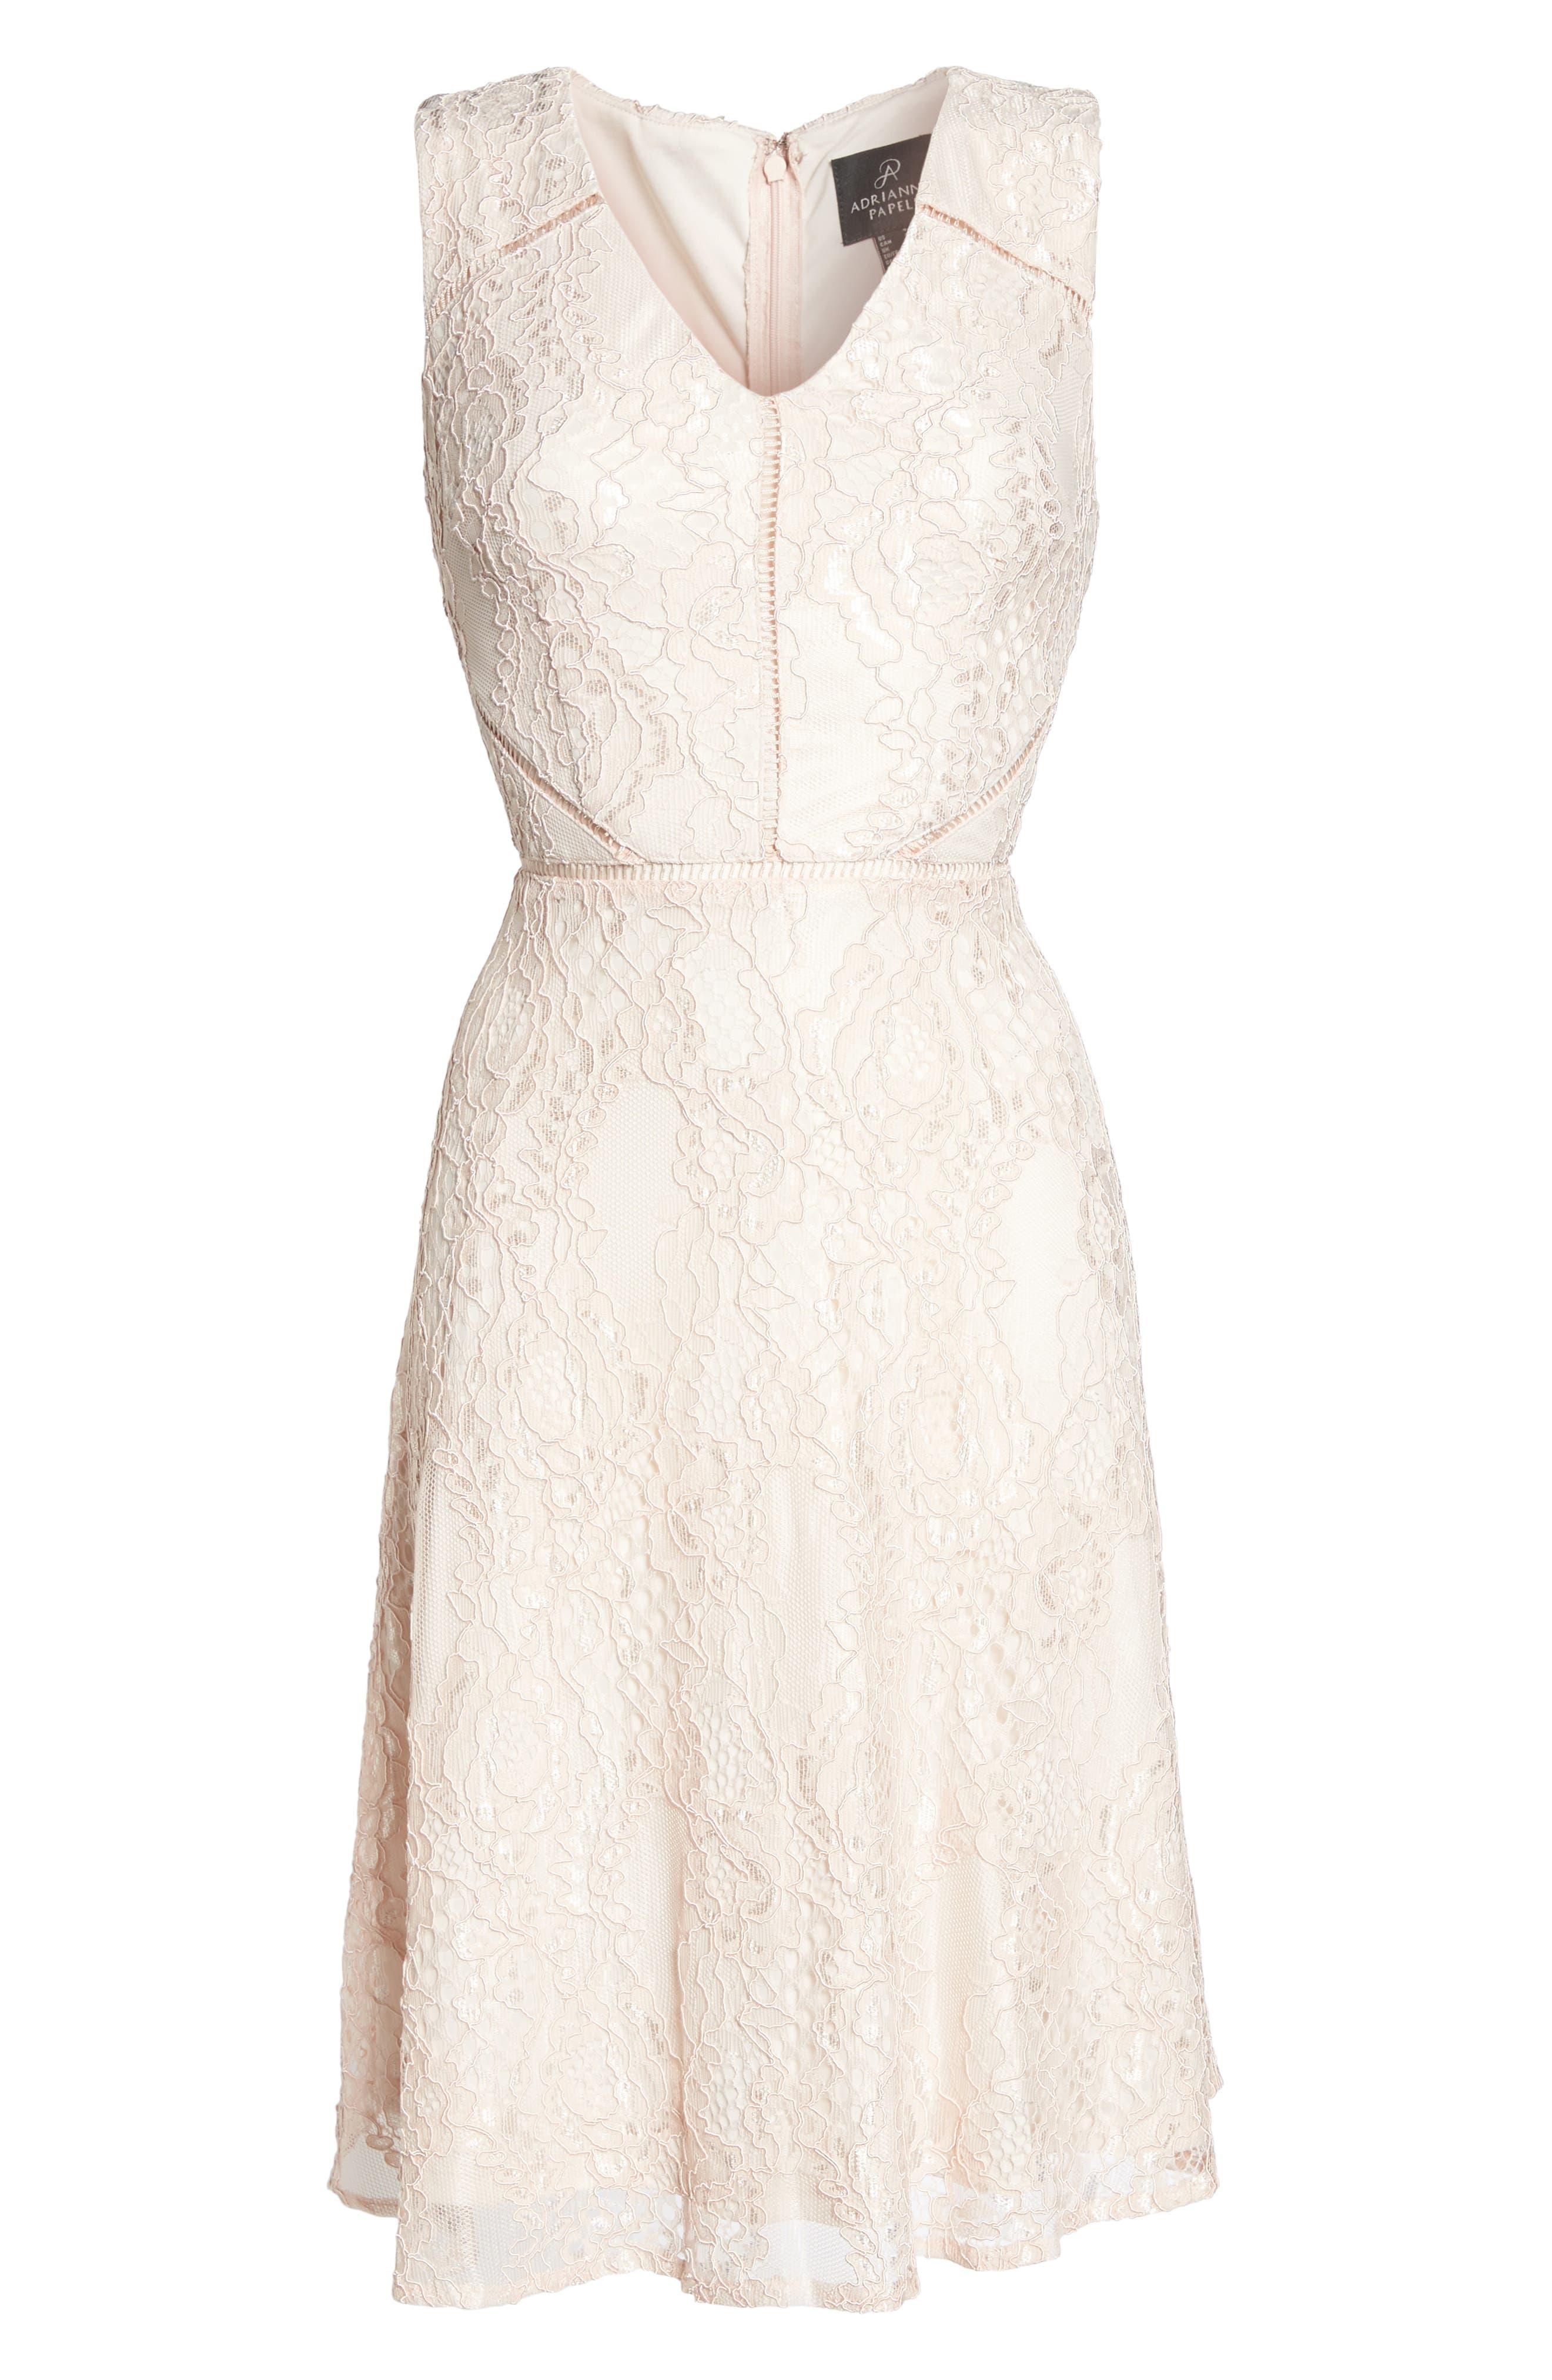 Rose Lace Fit & Flare Dress,                             Alternate thumbnail 6, color,                             Blush/ Almond